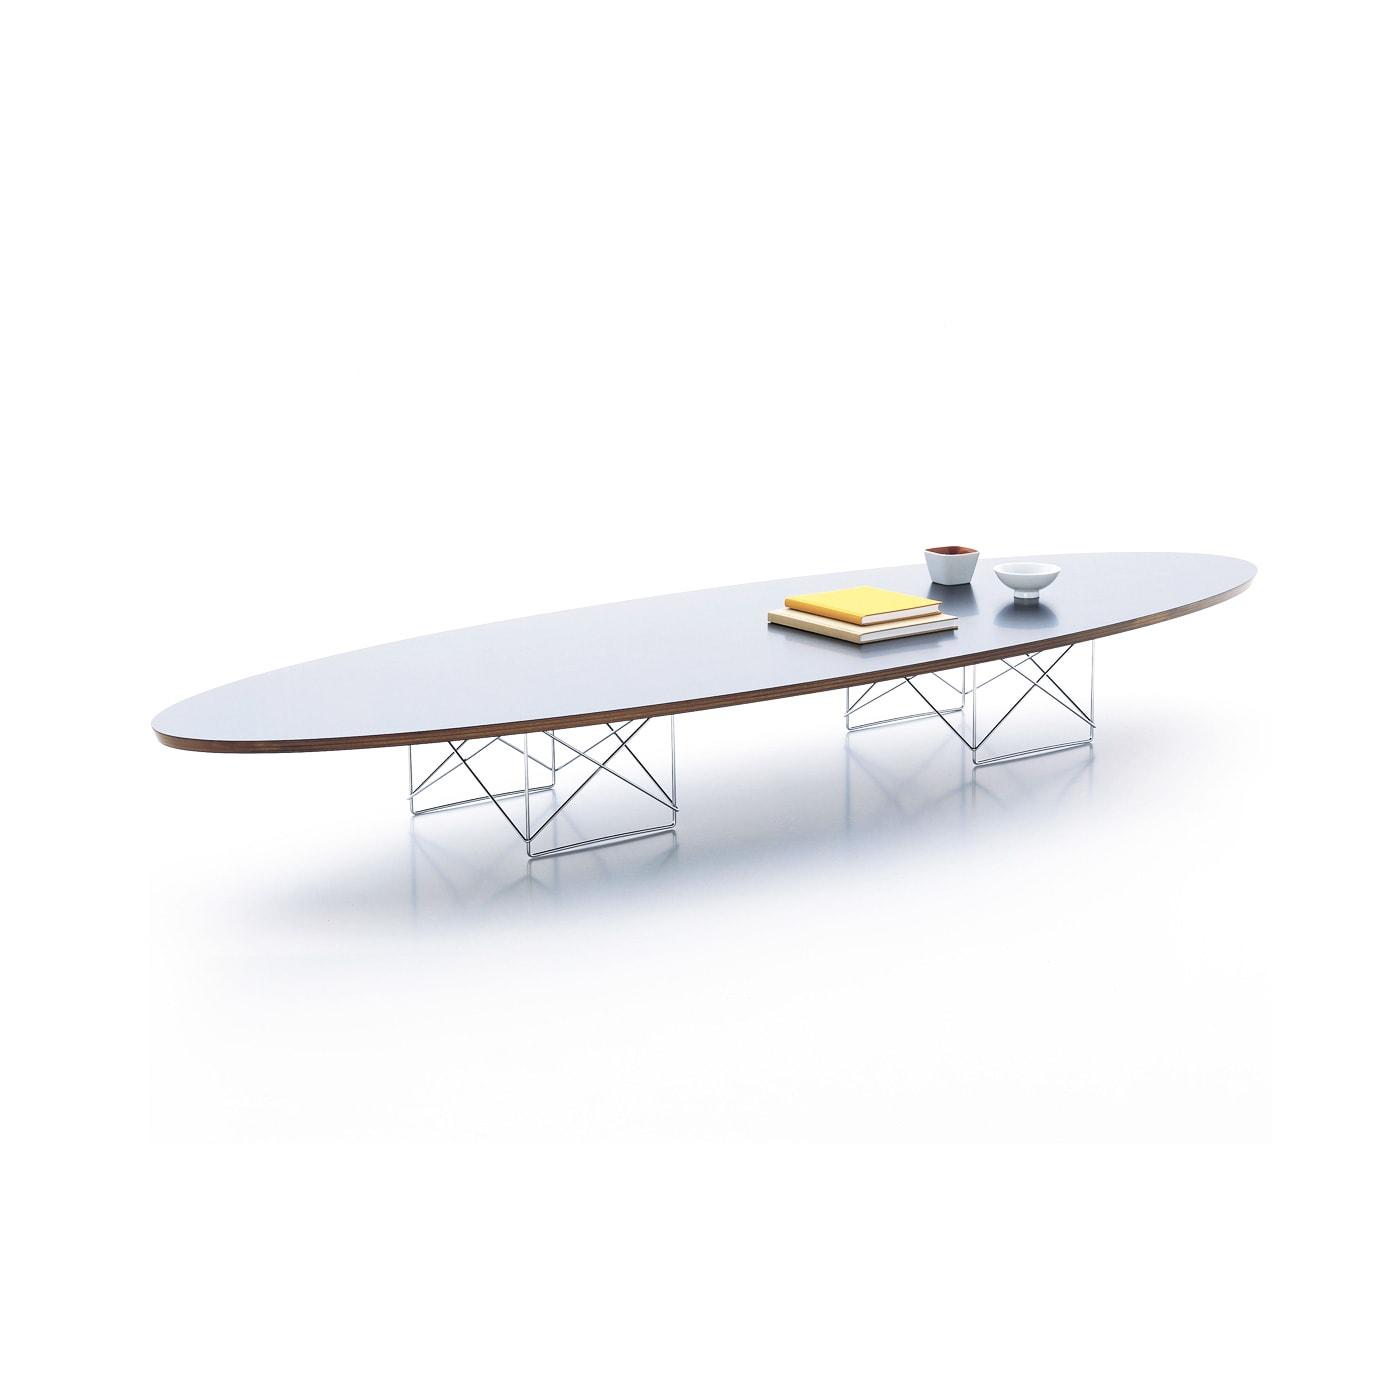 VITRA Elliptical Table ETR tavolino basso